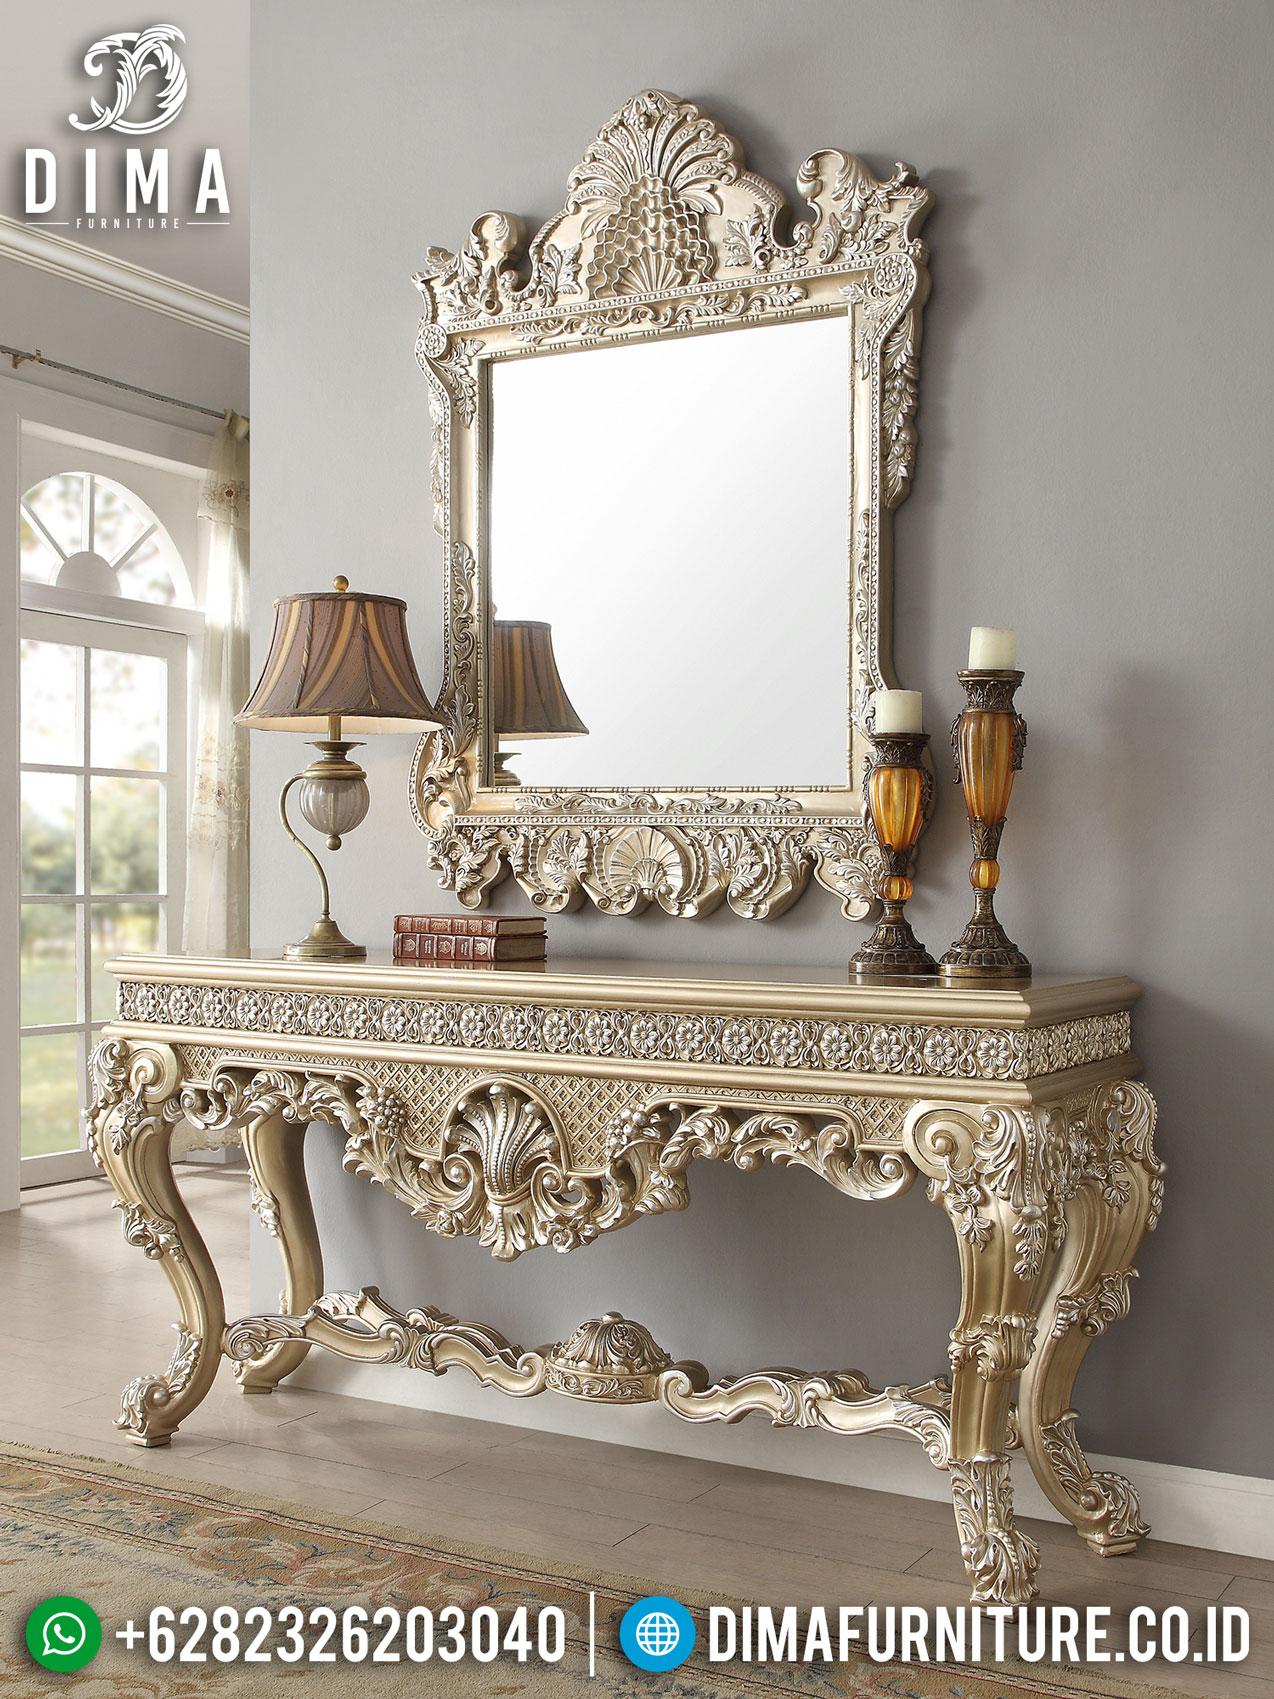 Fabiolla Meja Konsol Ukiran Mewah Luxury Classic Design Interior Inspiring Jepara ST-0948